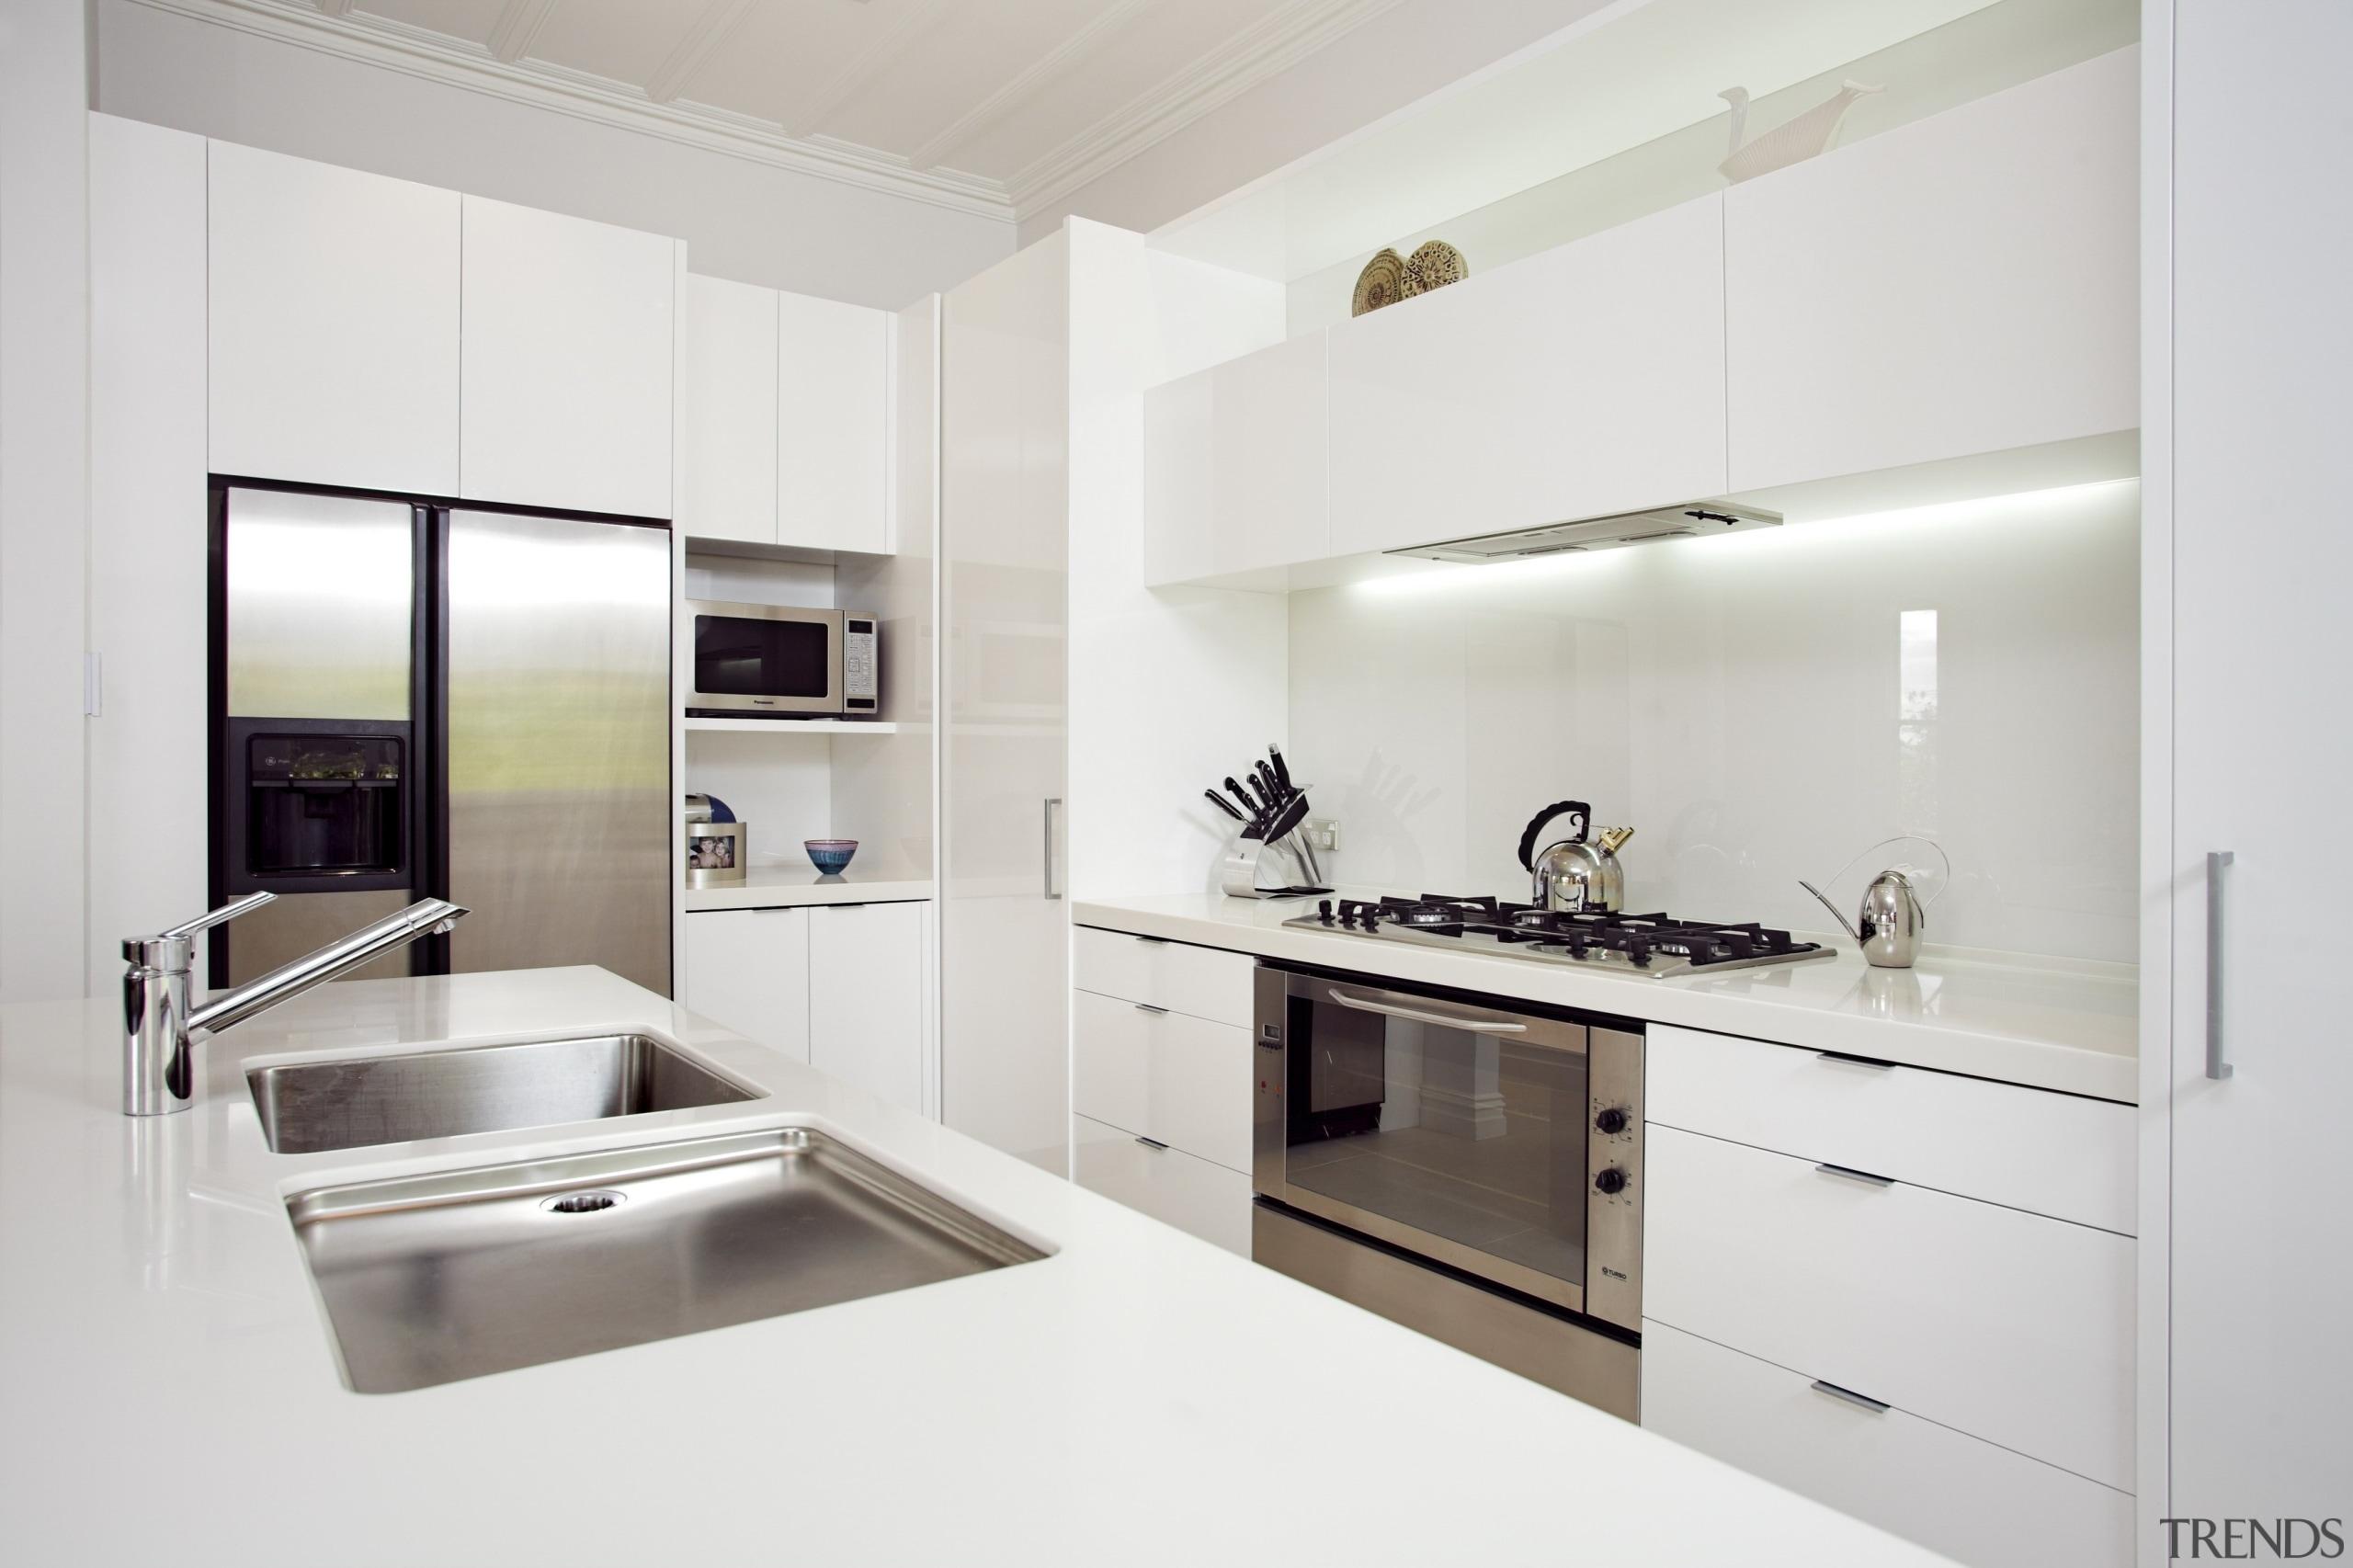 Ponsonby - countertop | home appliance | interior countertop, home appliance, interior design, kitchen, real estate, room, white